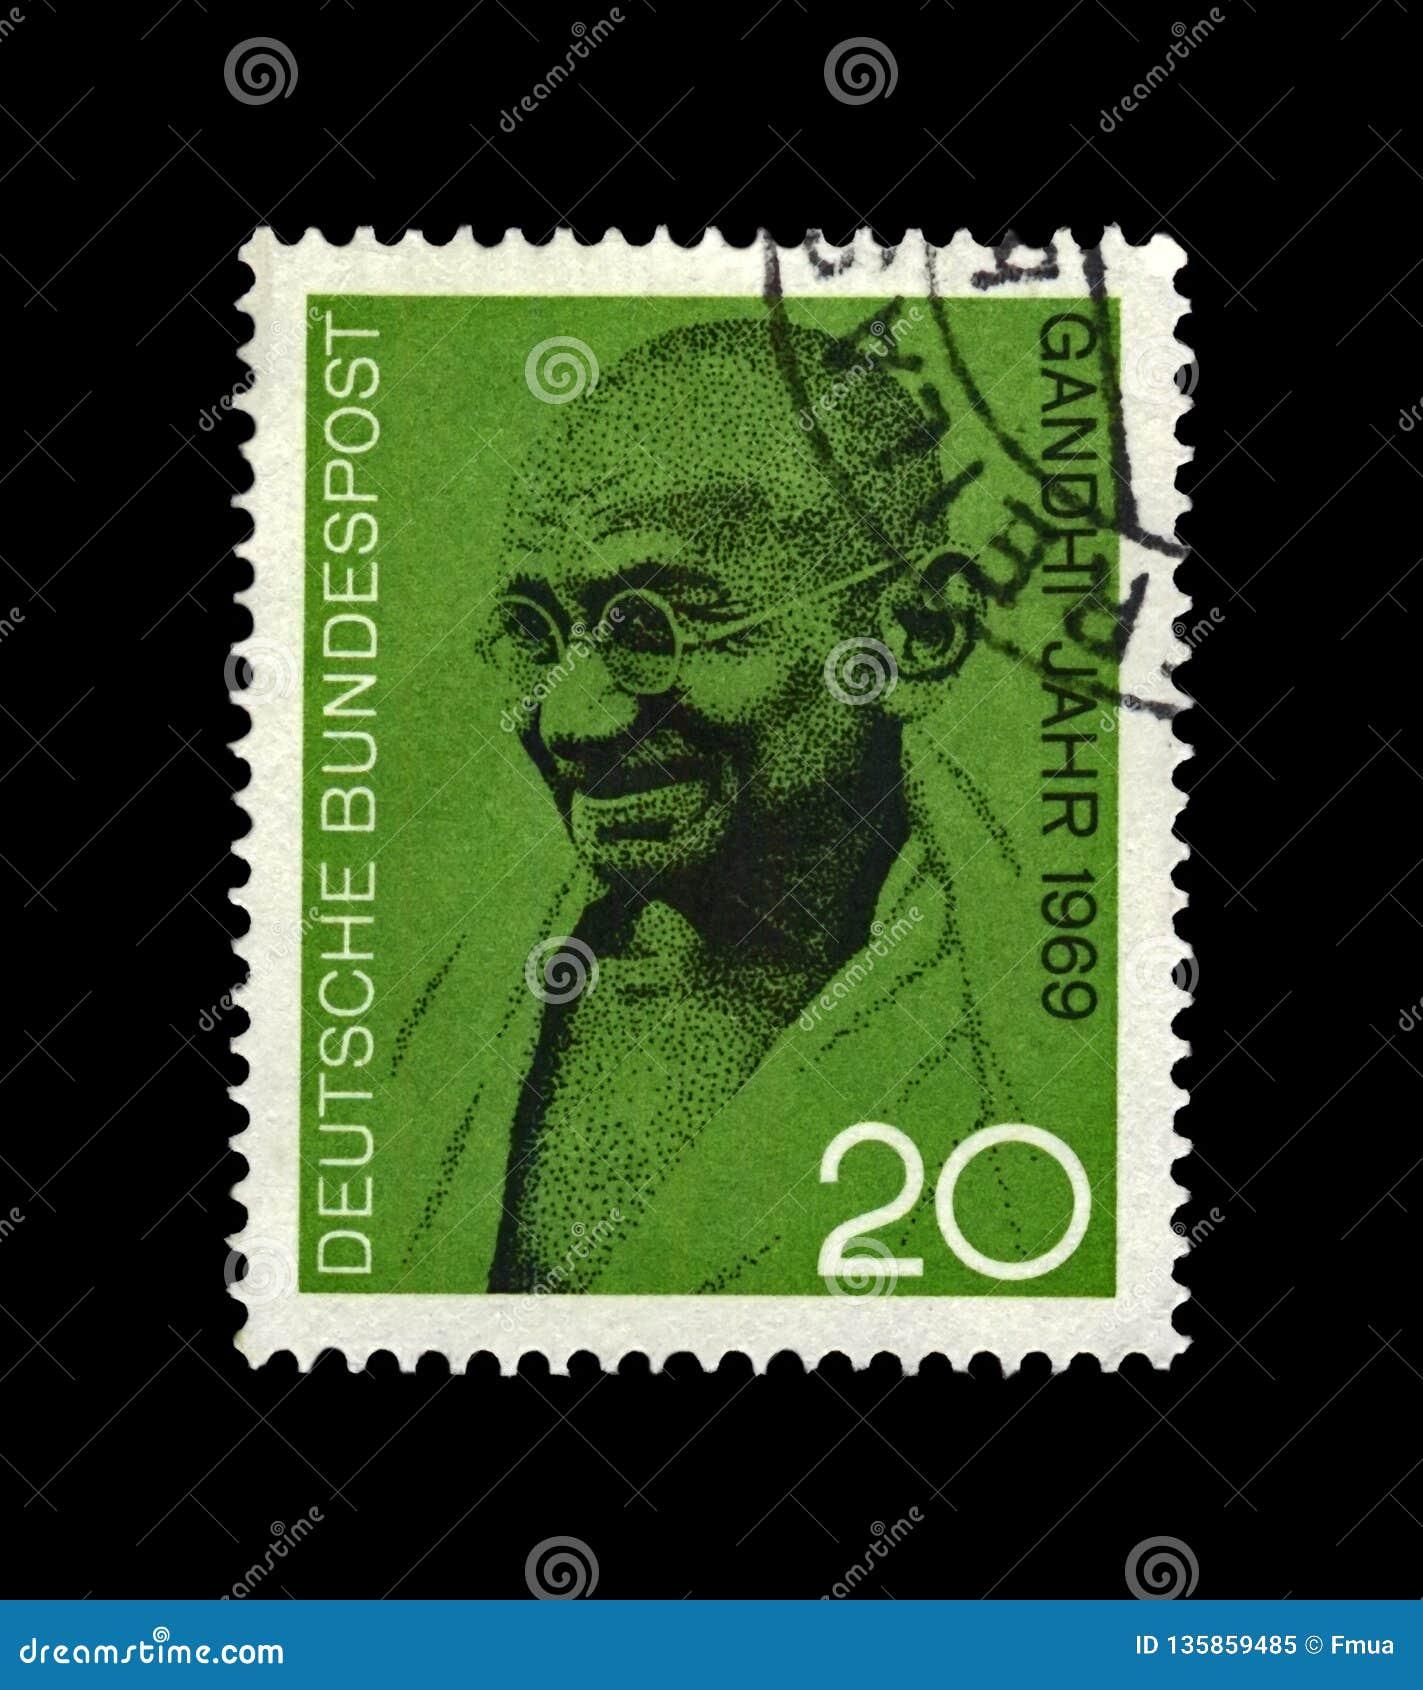 Mahatma Gandhi 1869-1948 aka Mohandas Karamchand Gandhi, attivista indiano famoso, capo del movimento di indipendenza indiana,